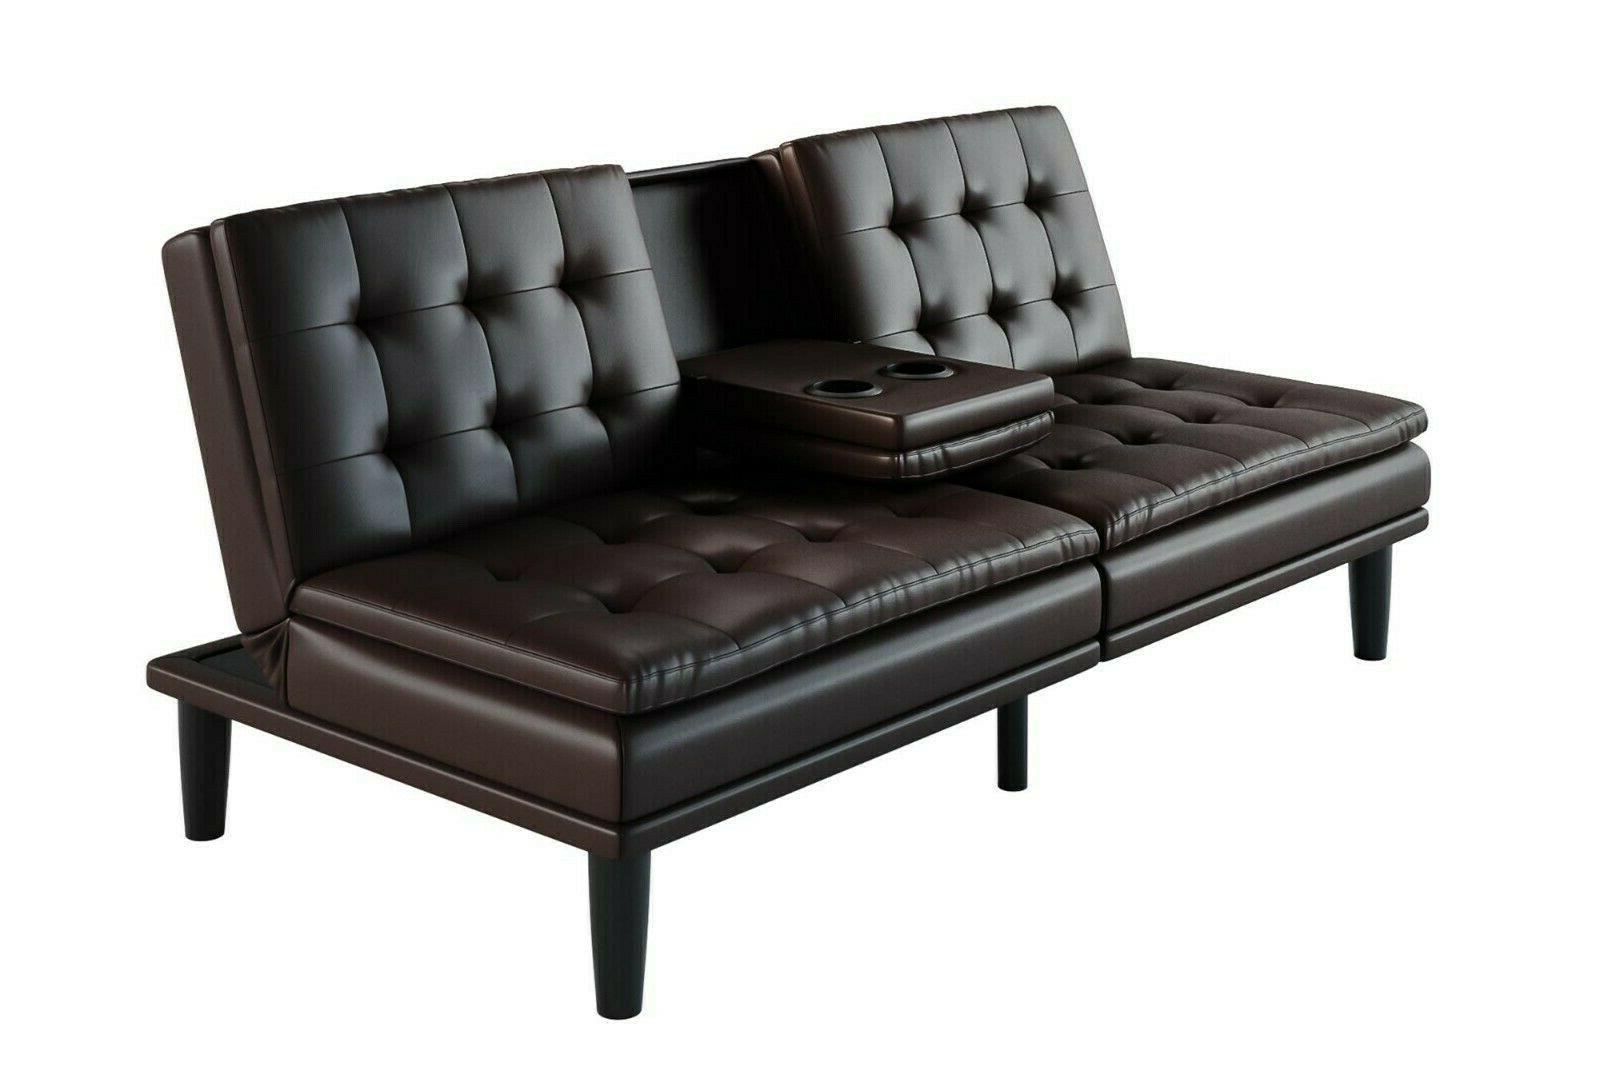 Sofa Bed Futon Leather Style